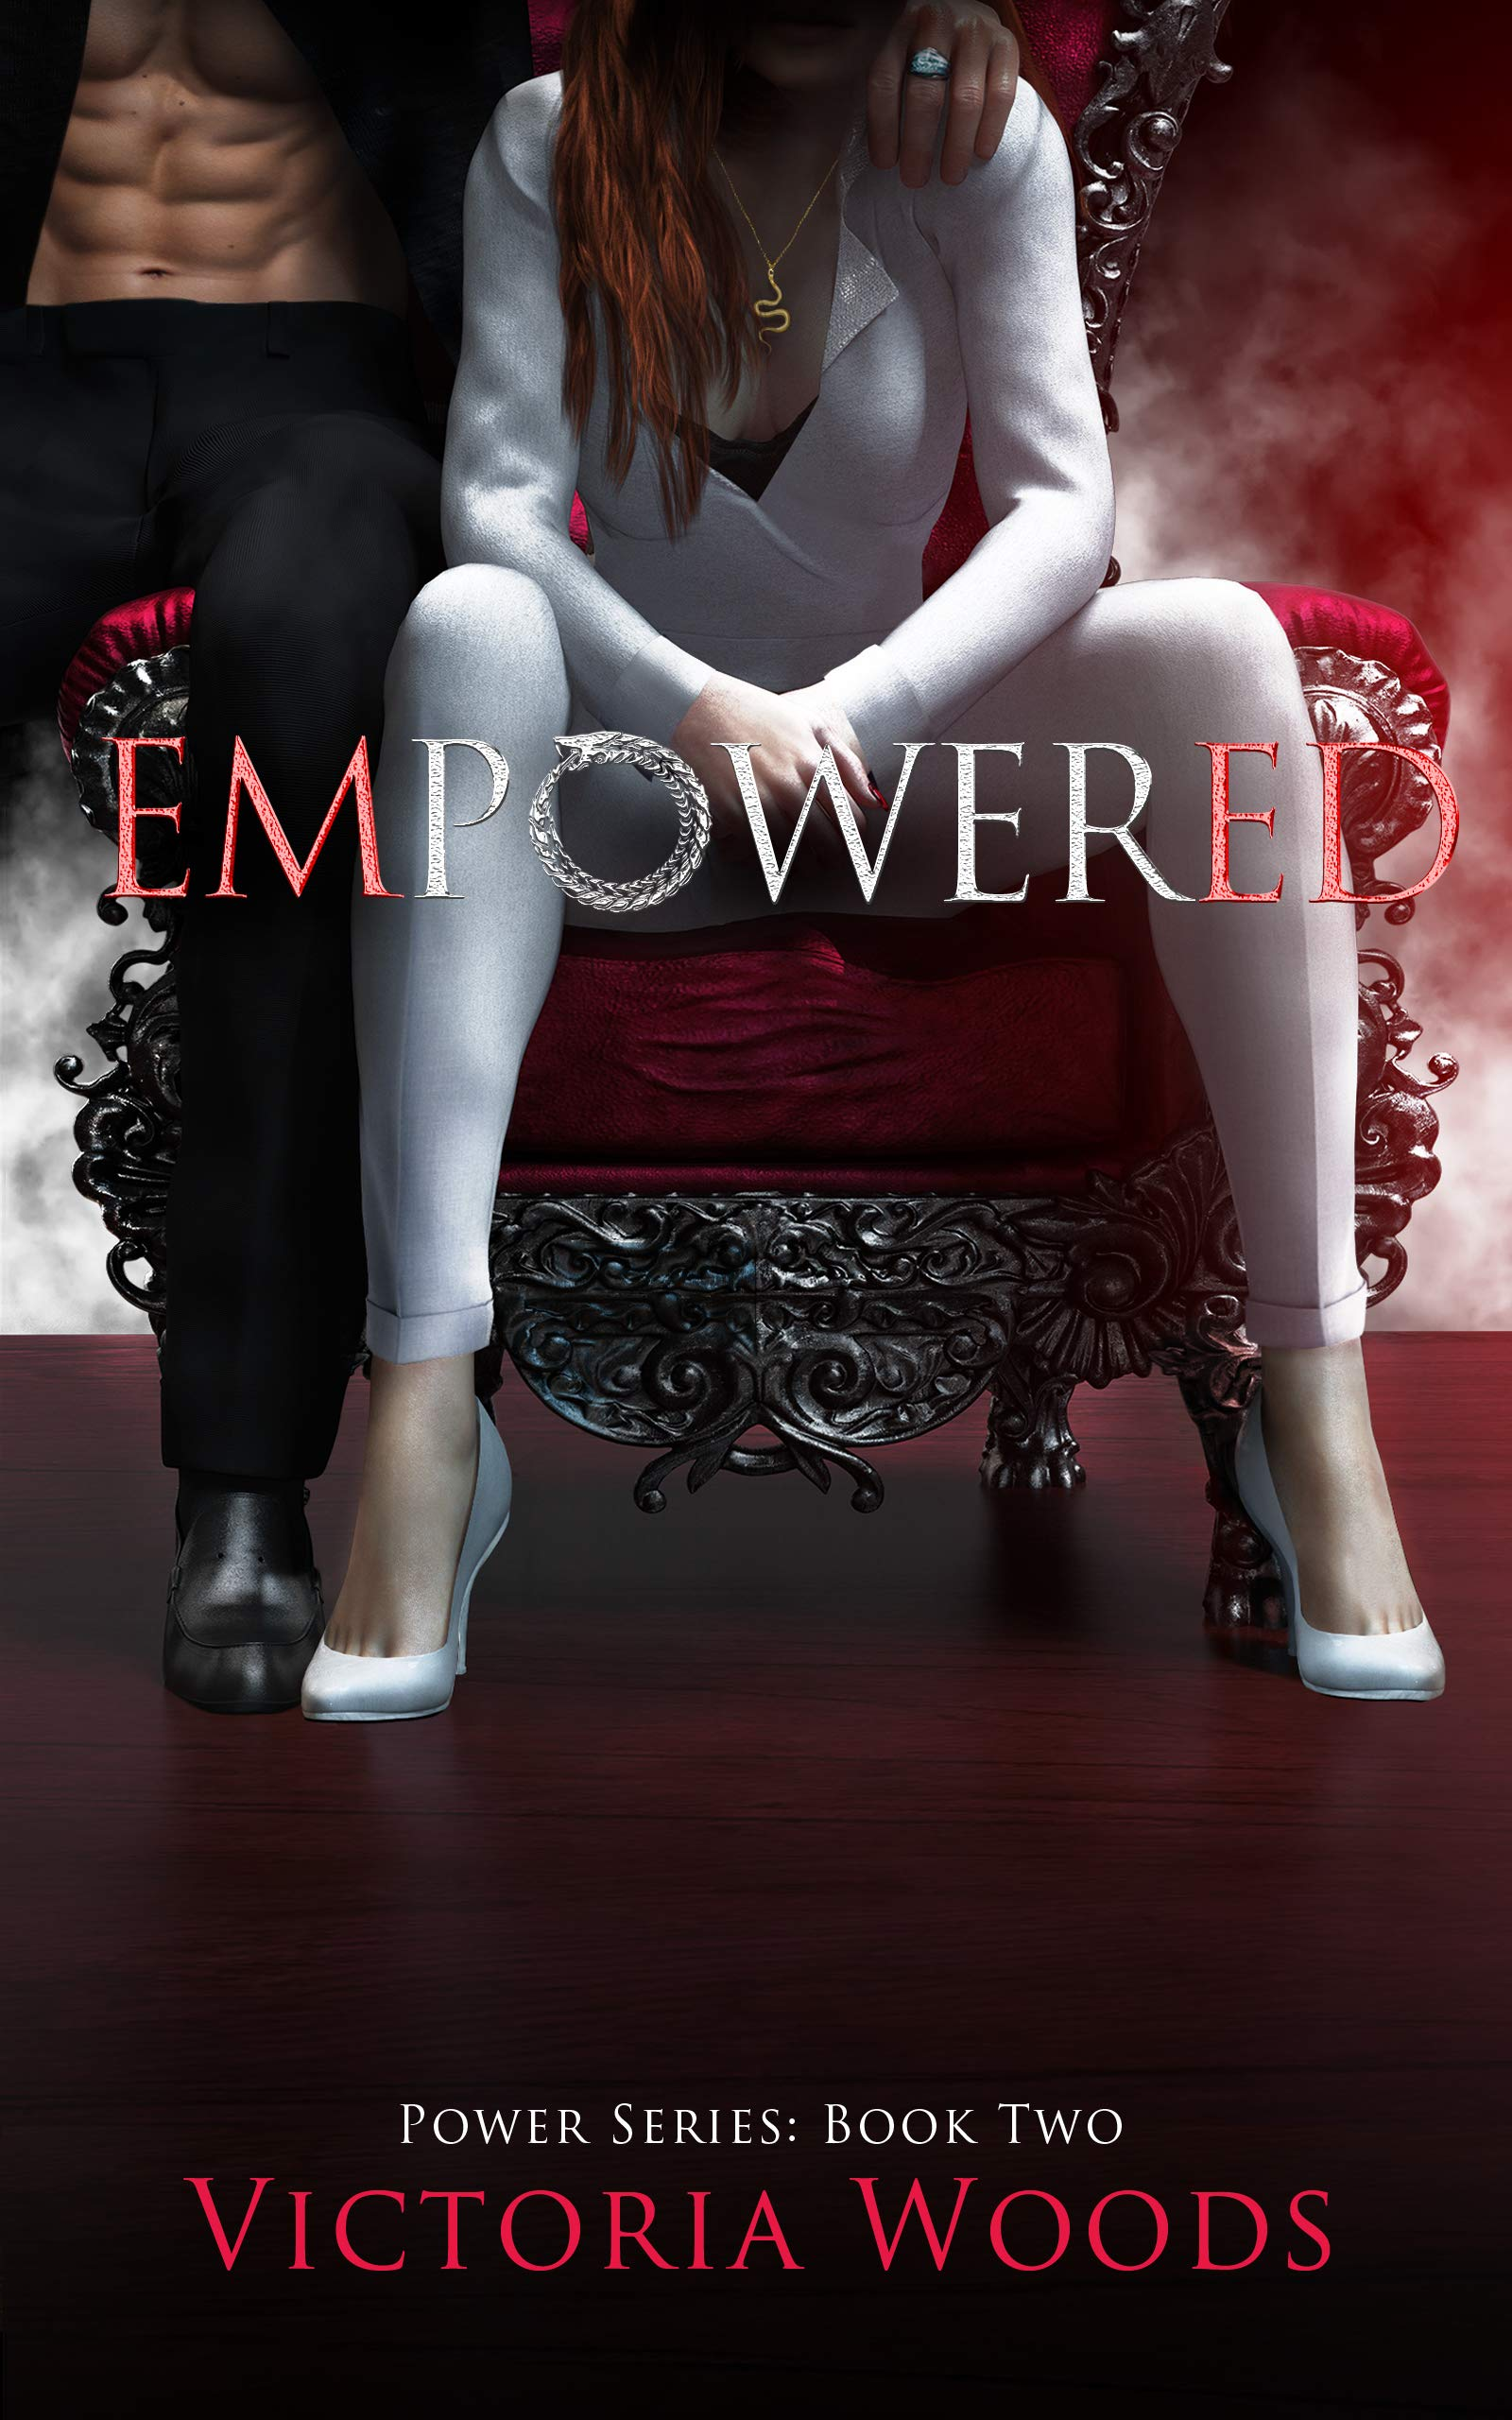 Empowered: Power Series #2 Victoria Woods